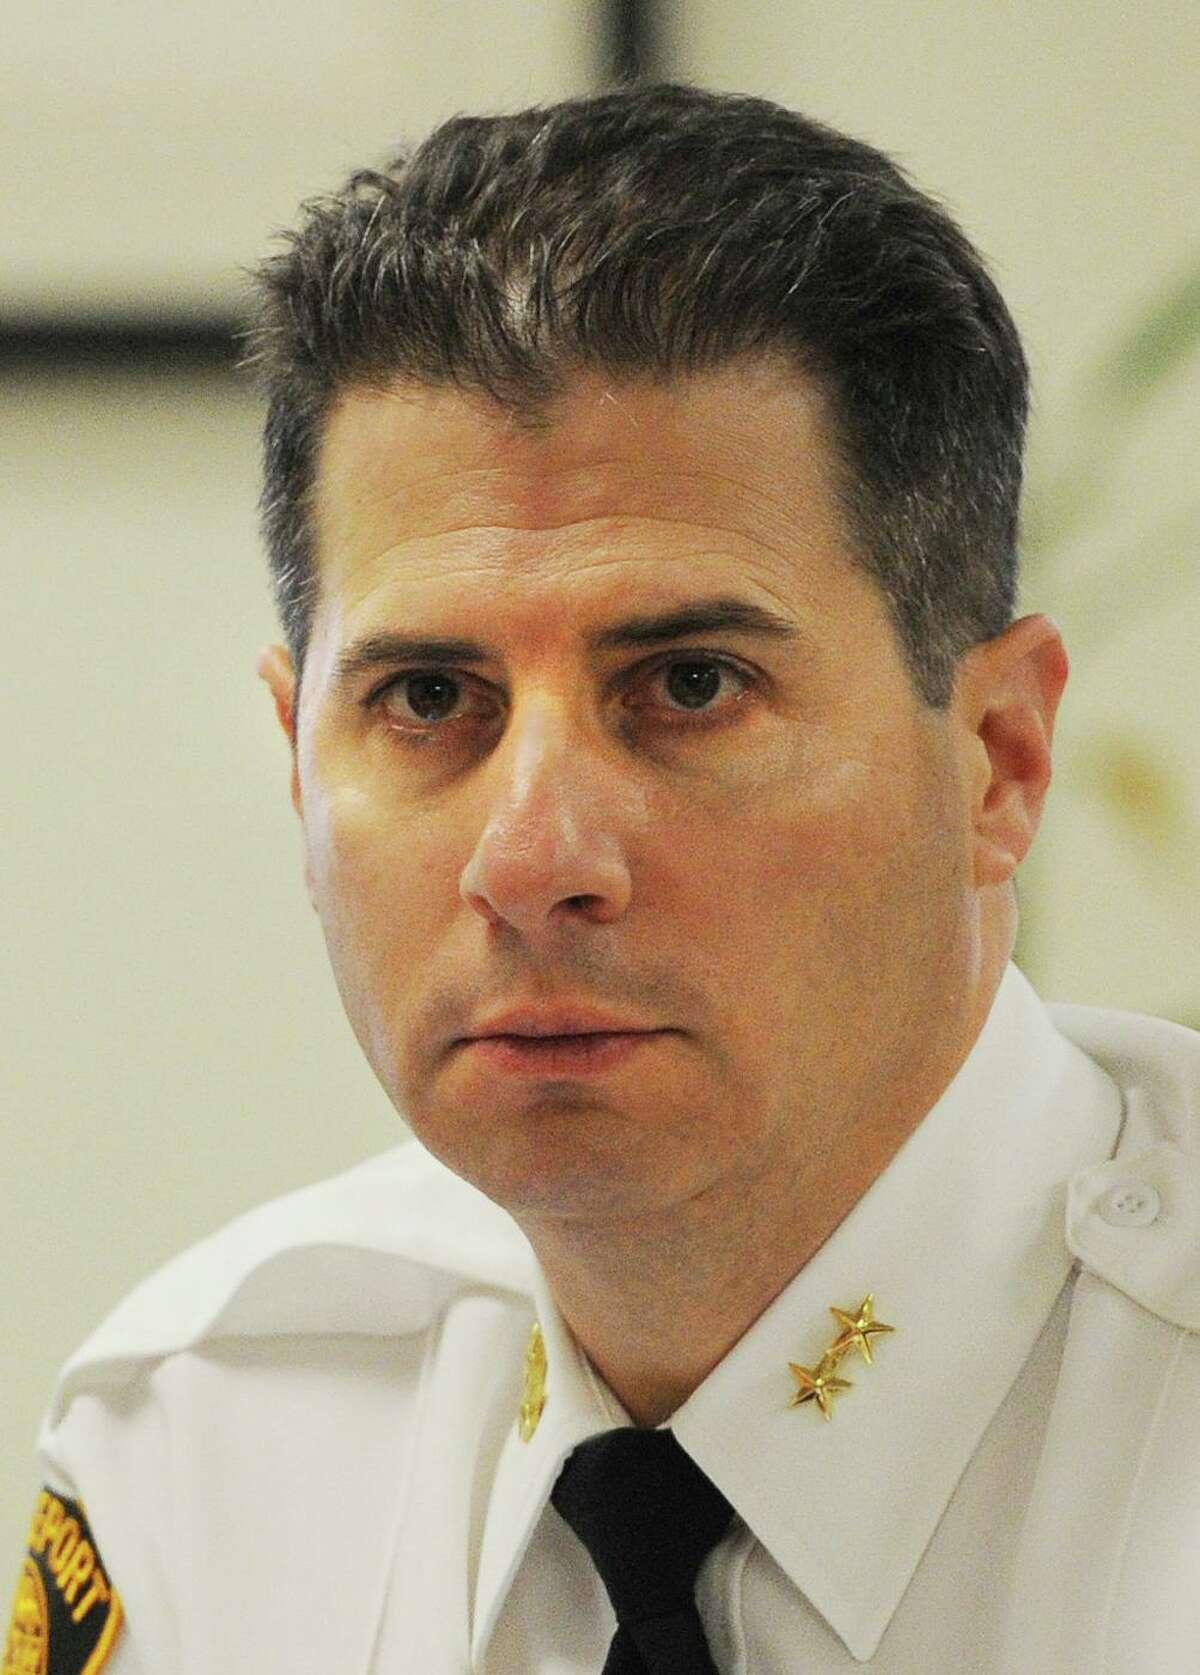 Former Bridgeport Police Assistant Chief James Nardozzi.